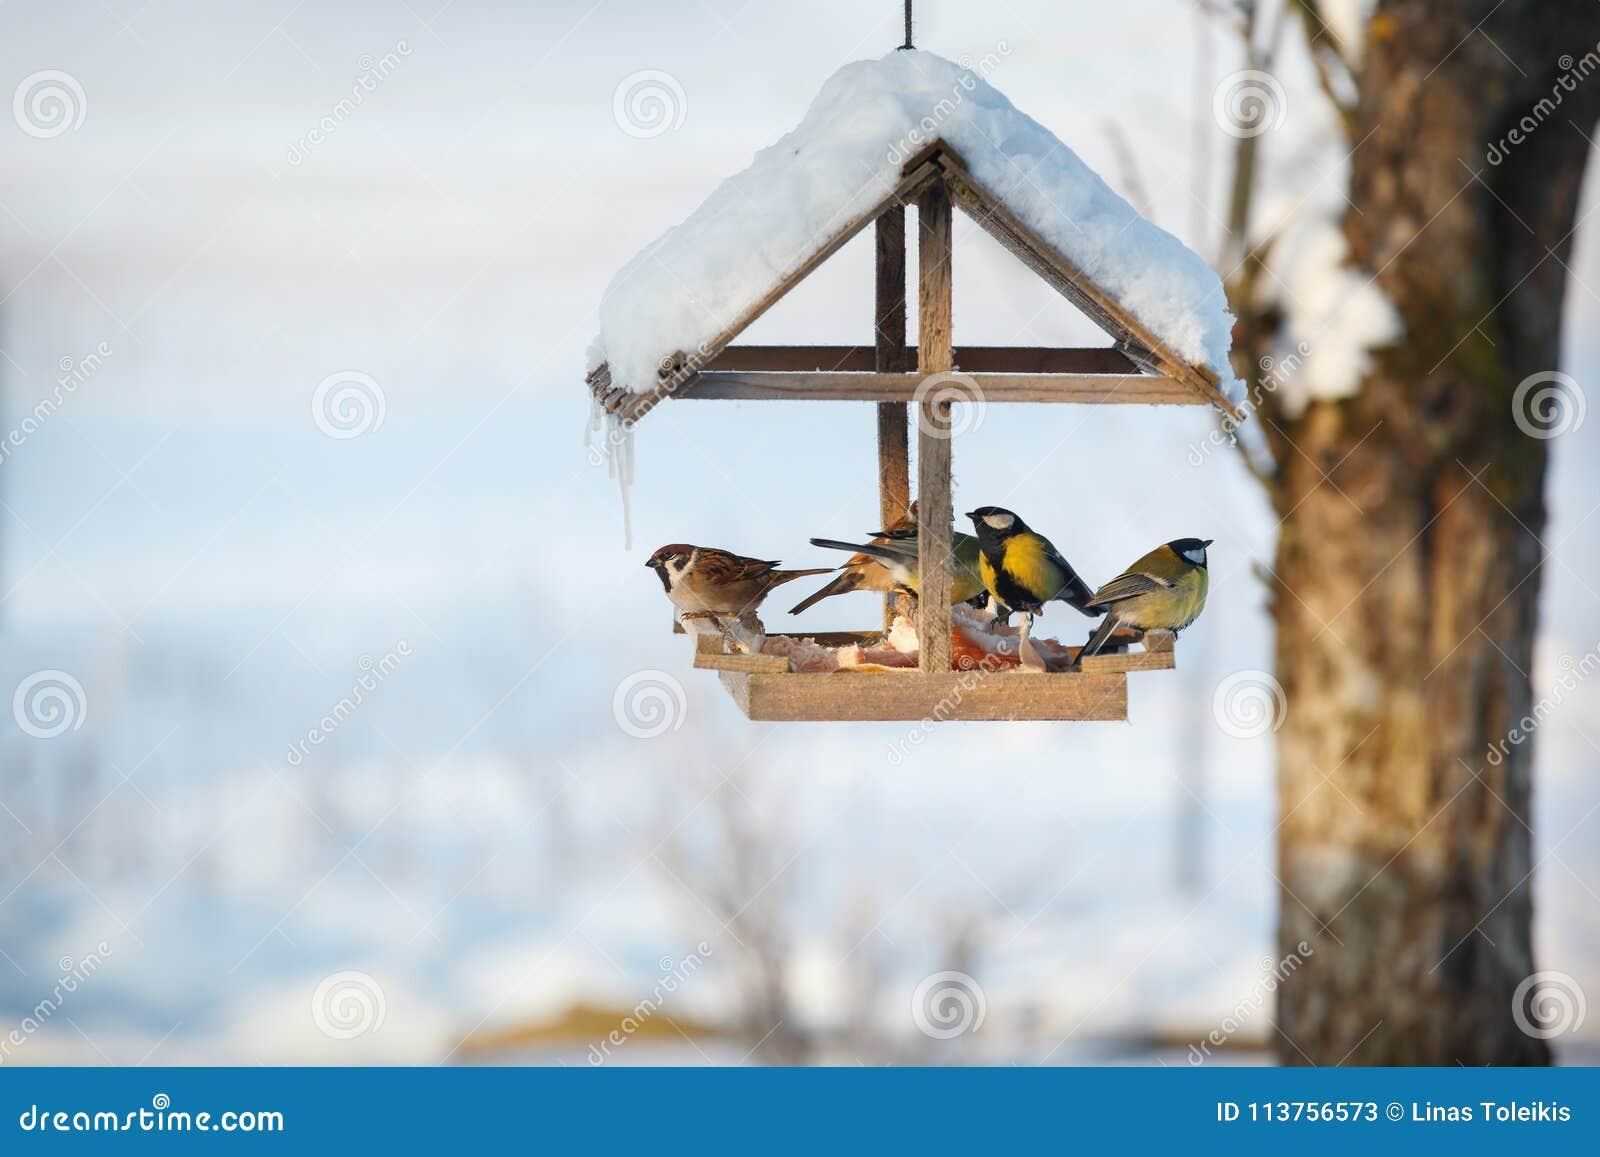 Five birds in the feeder